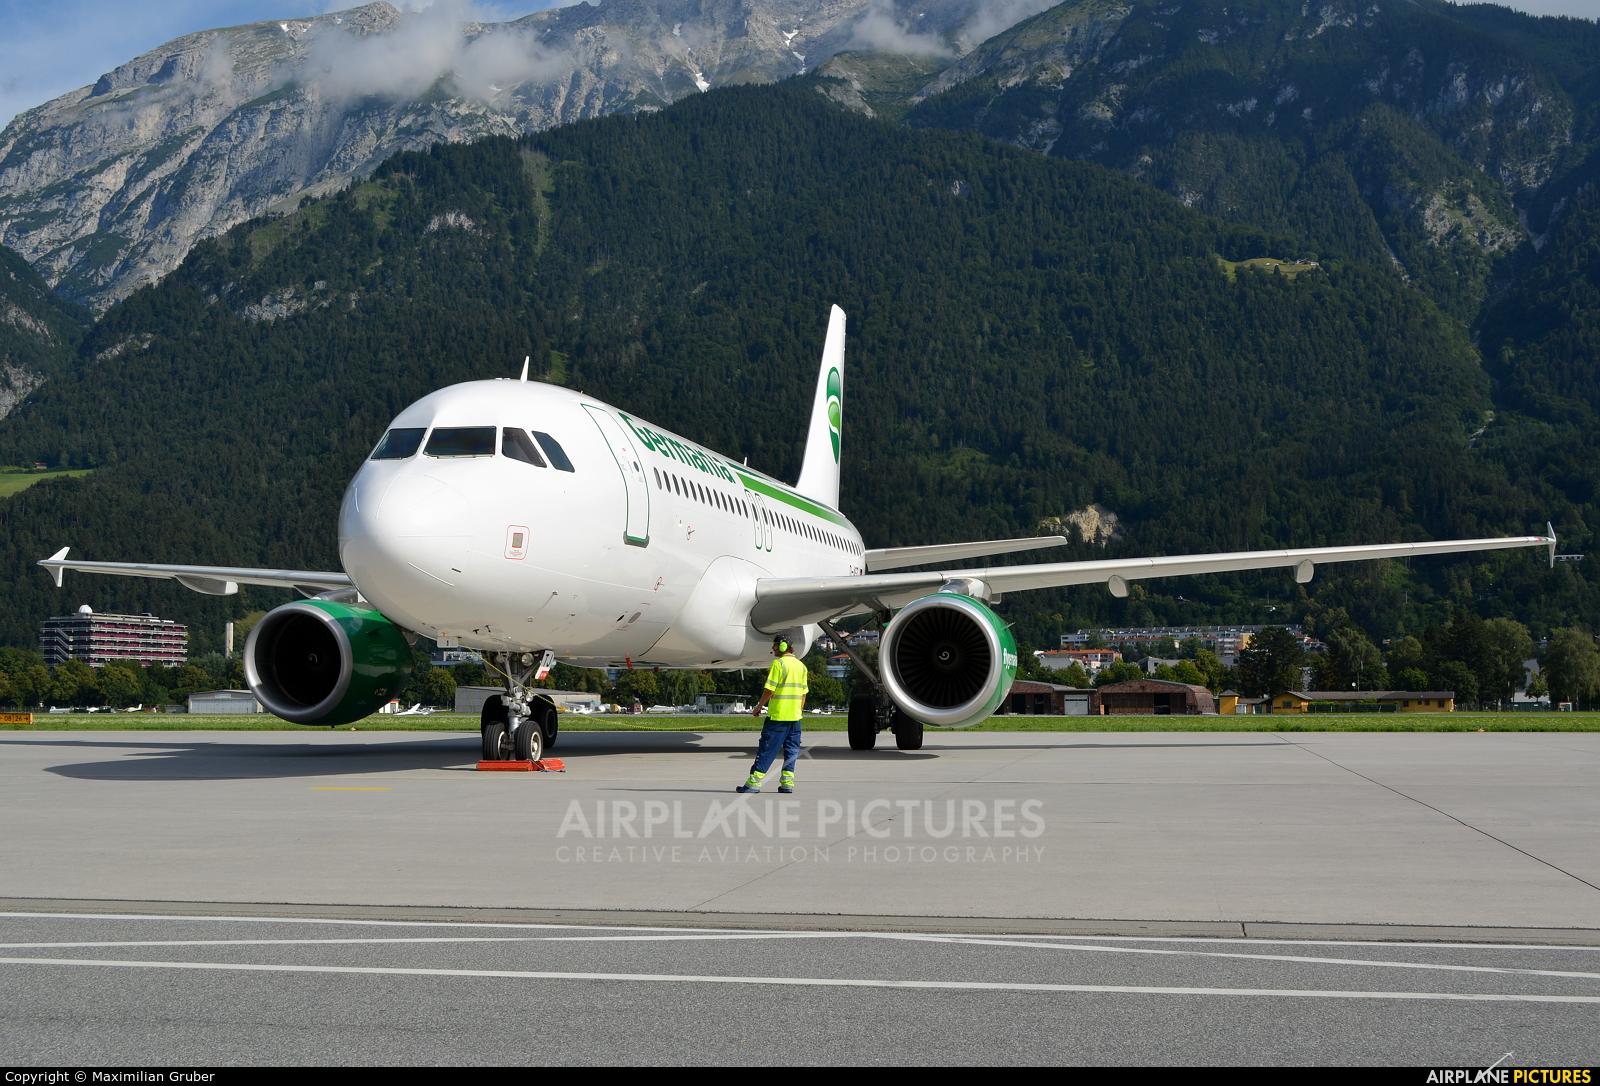 Germania D-ASTJ aircraft at Innsbruck